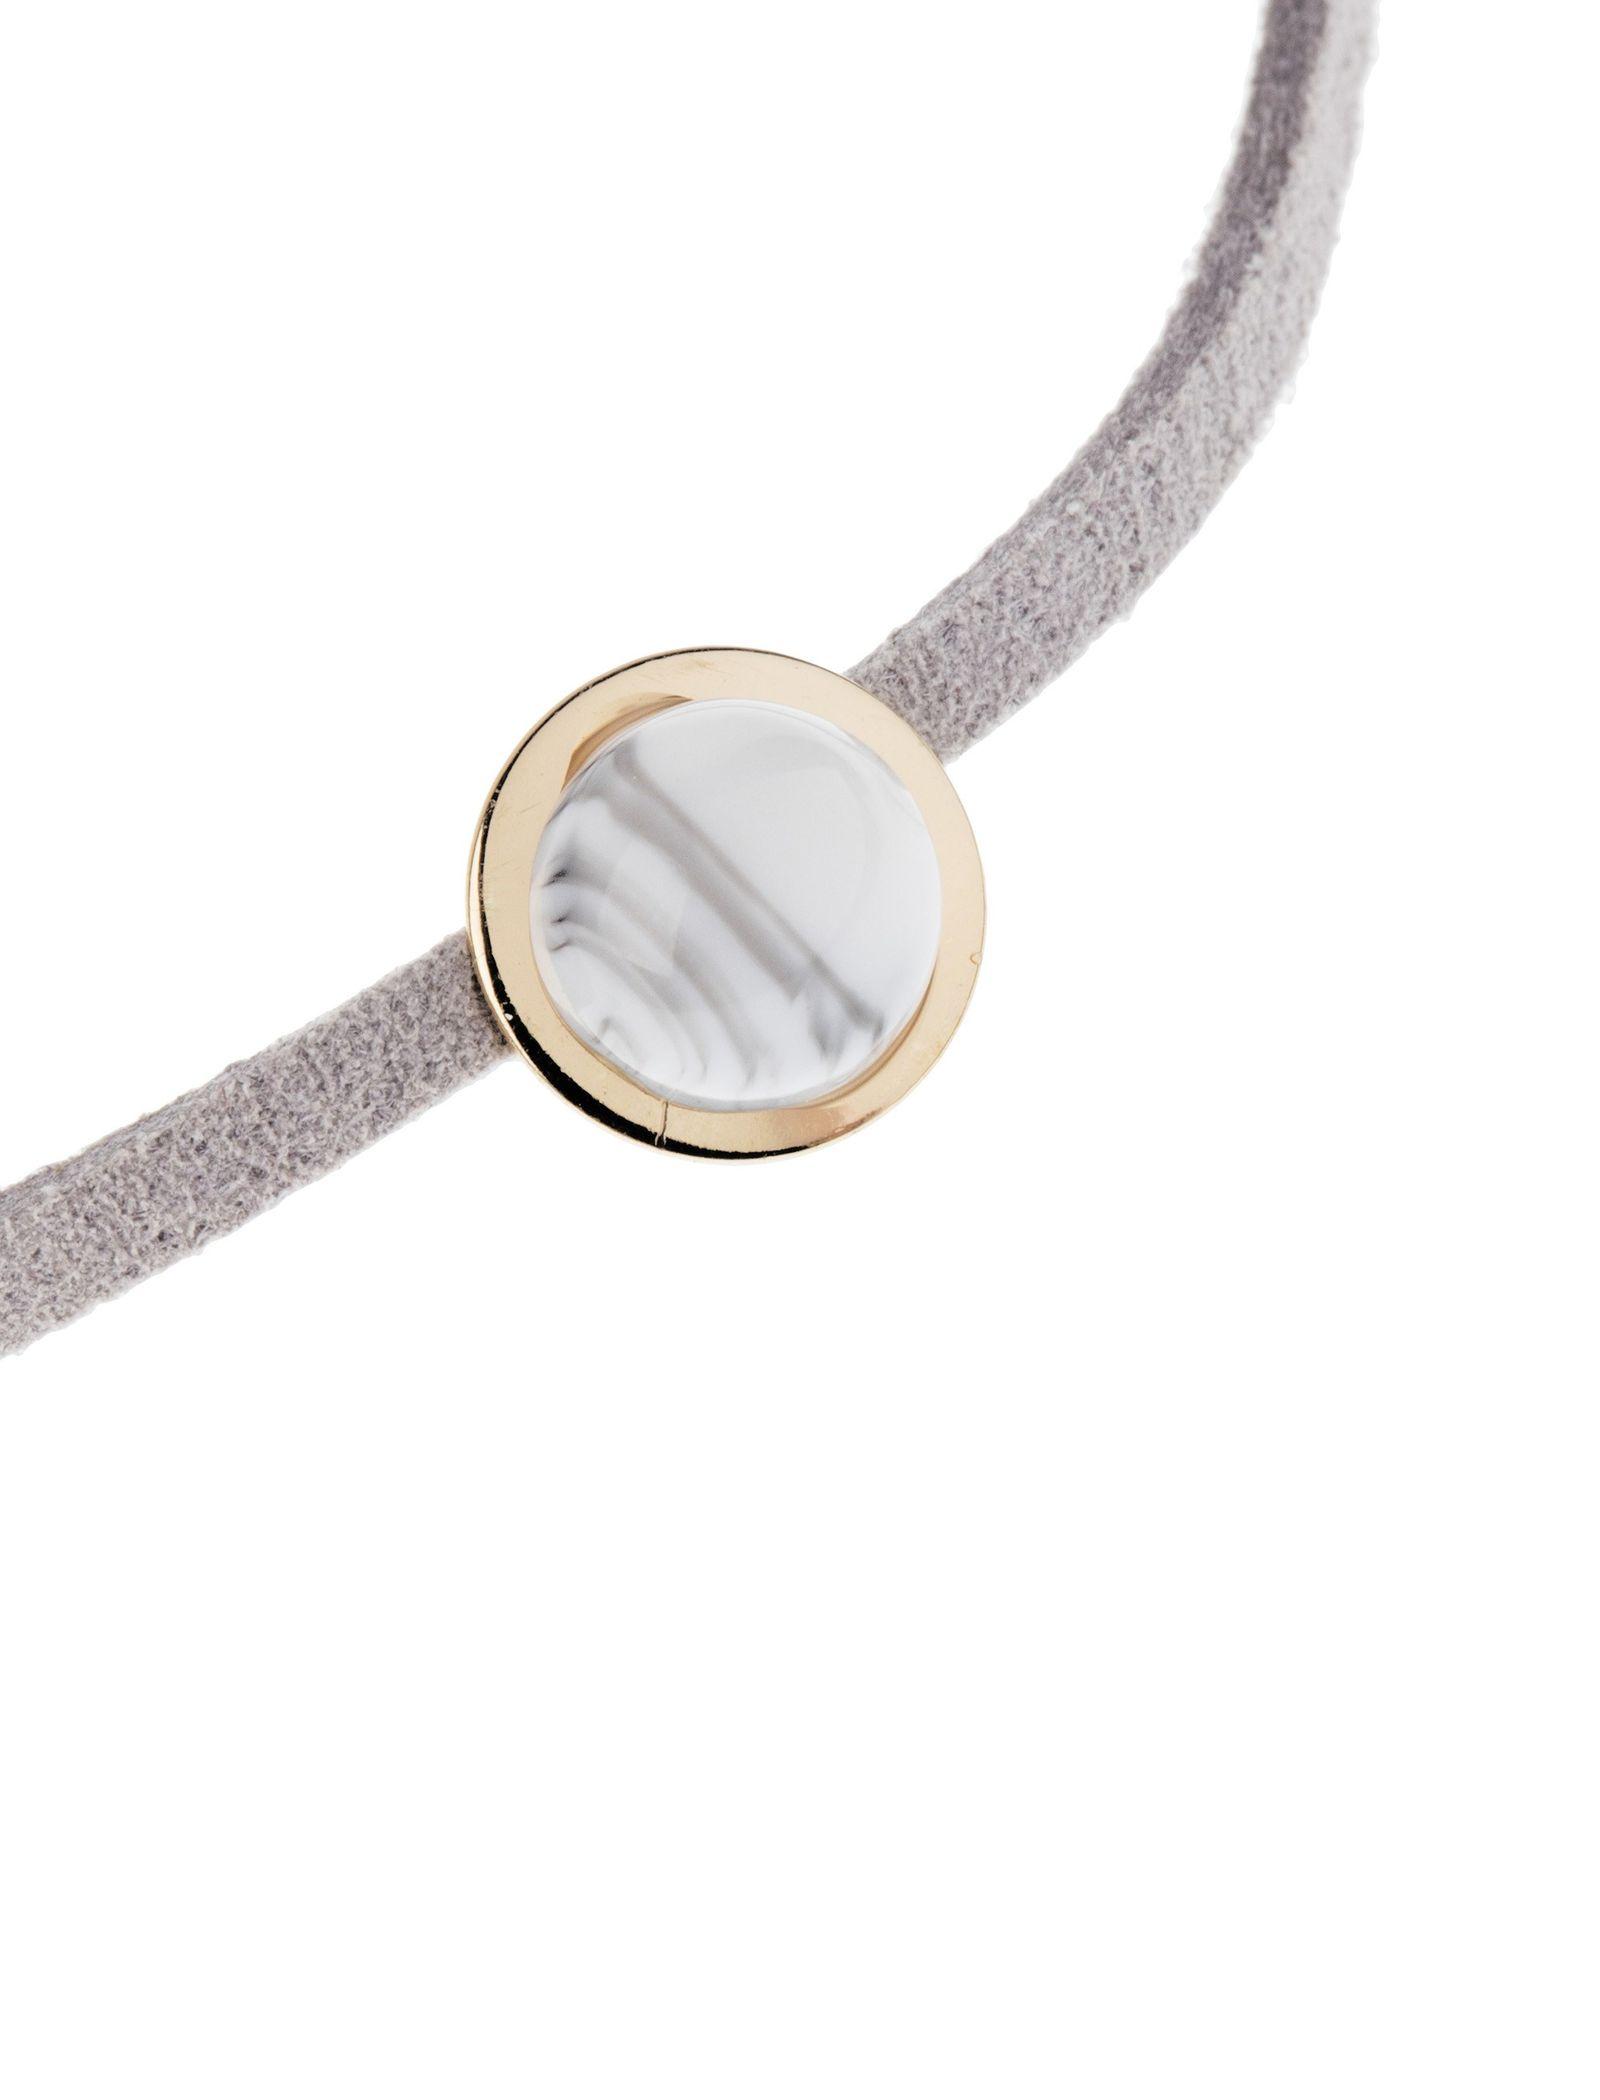 دستبند زنانه بسته 3 عددی - کوتون - طلايي/ طوسي - 8